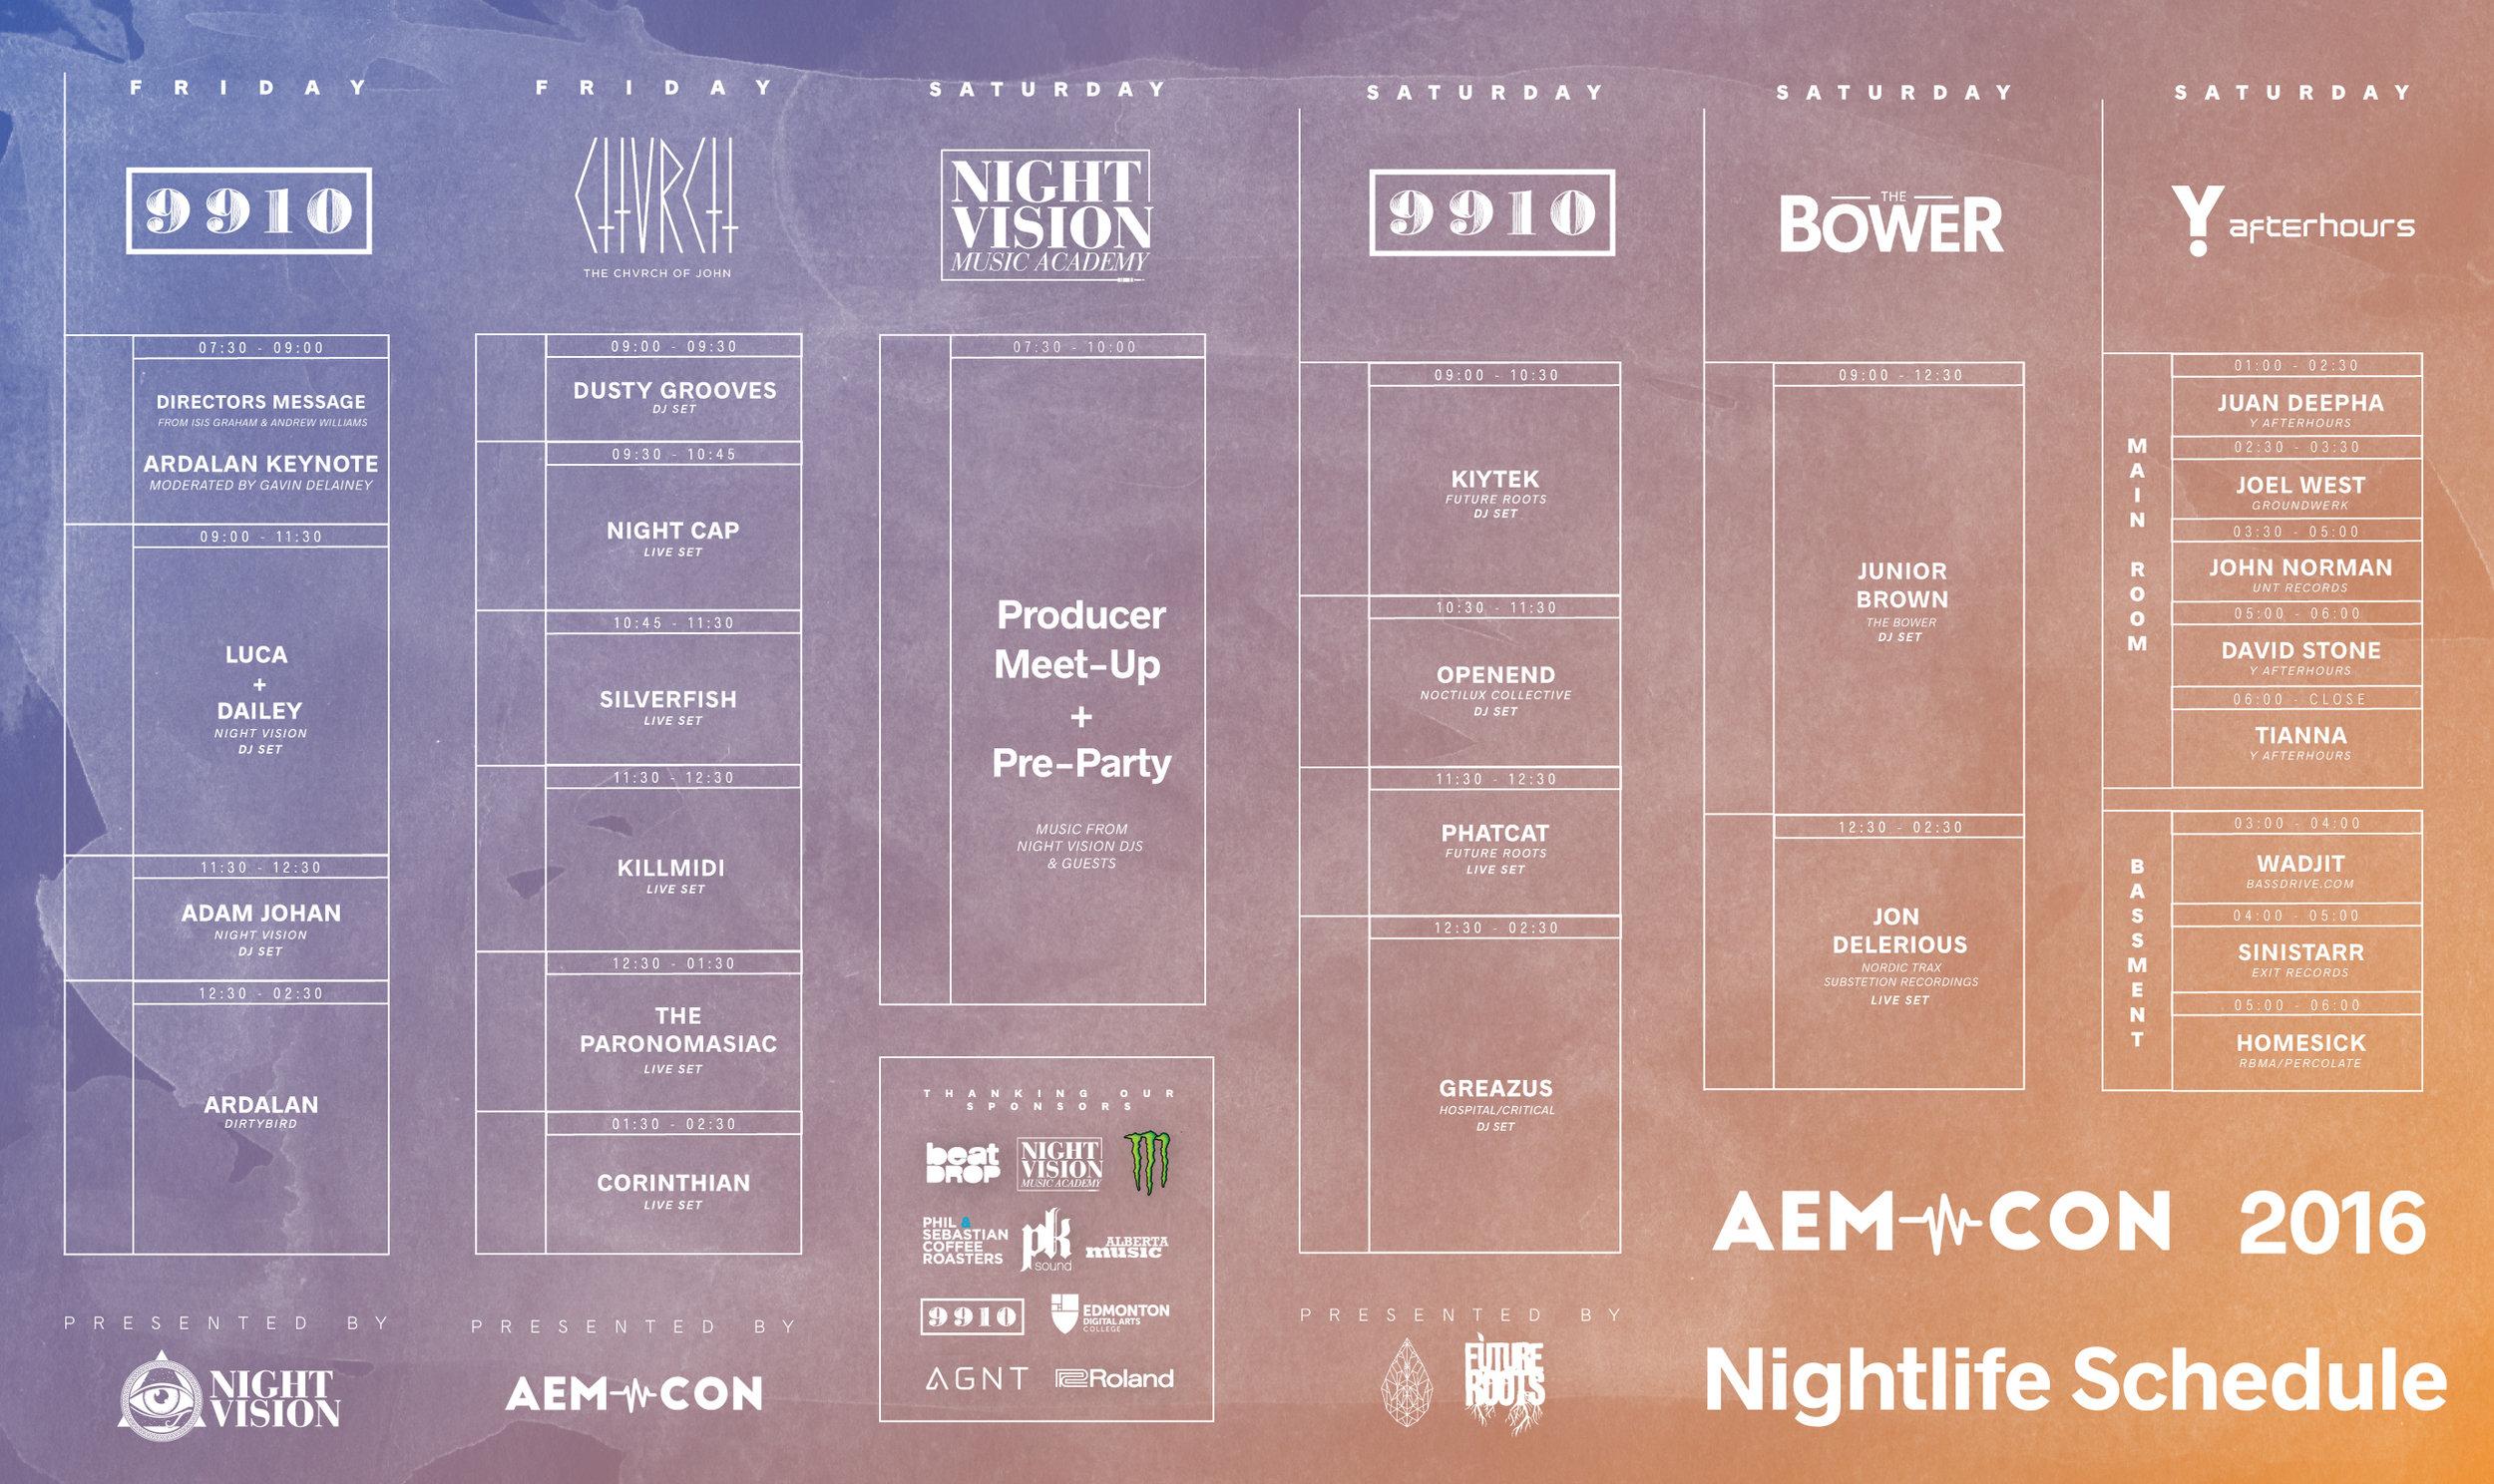 AEMCON-Night-Schedule.jpg